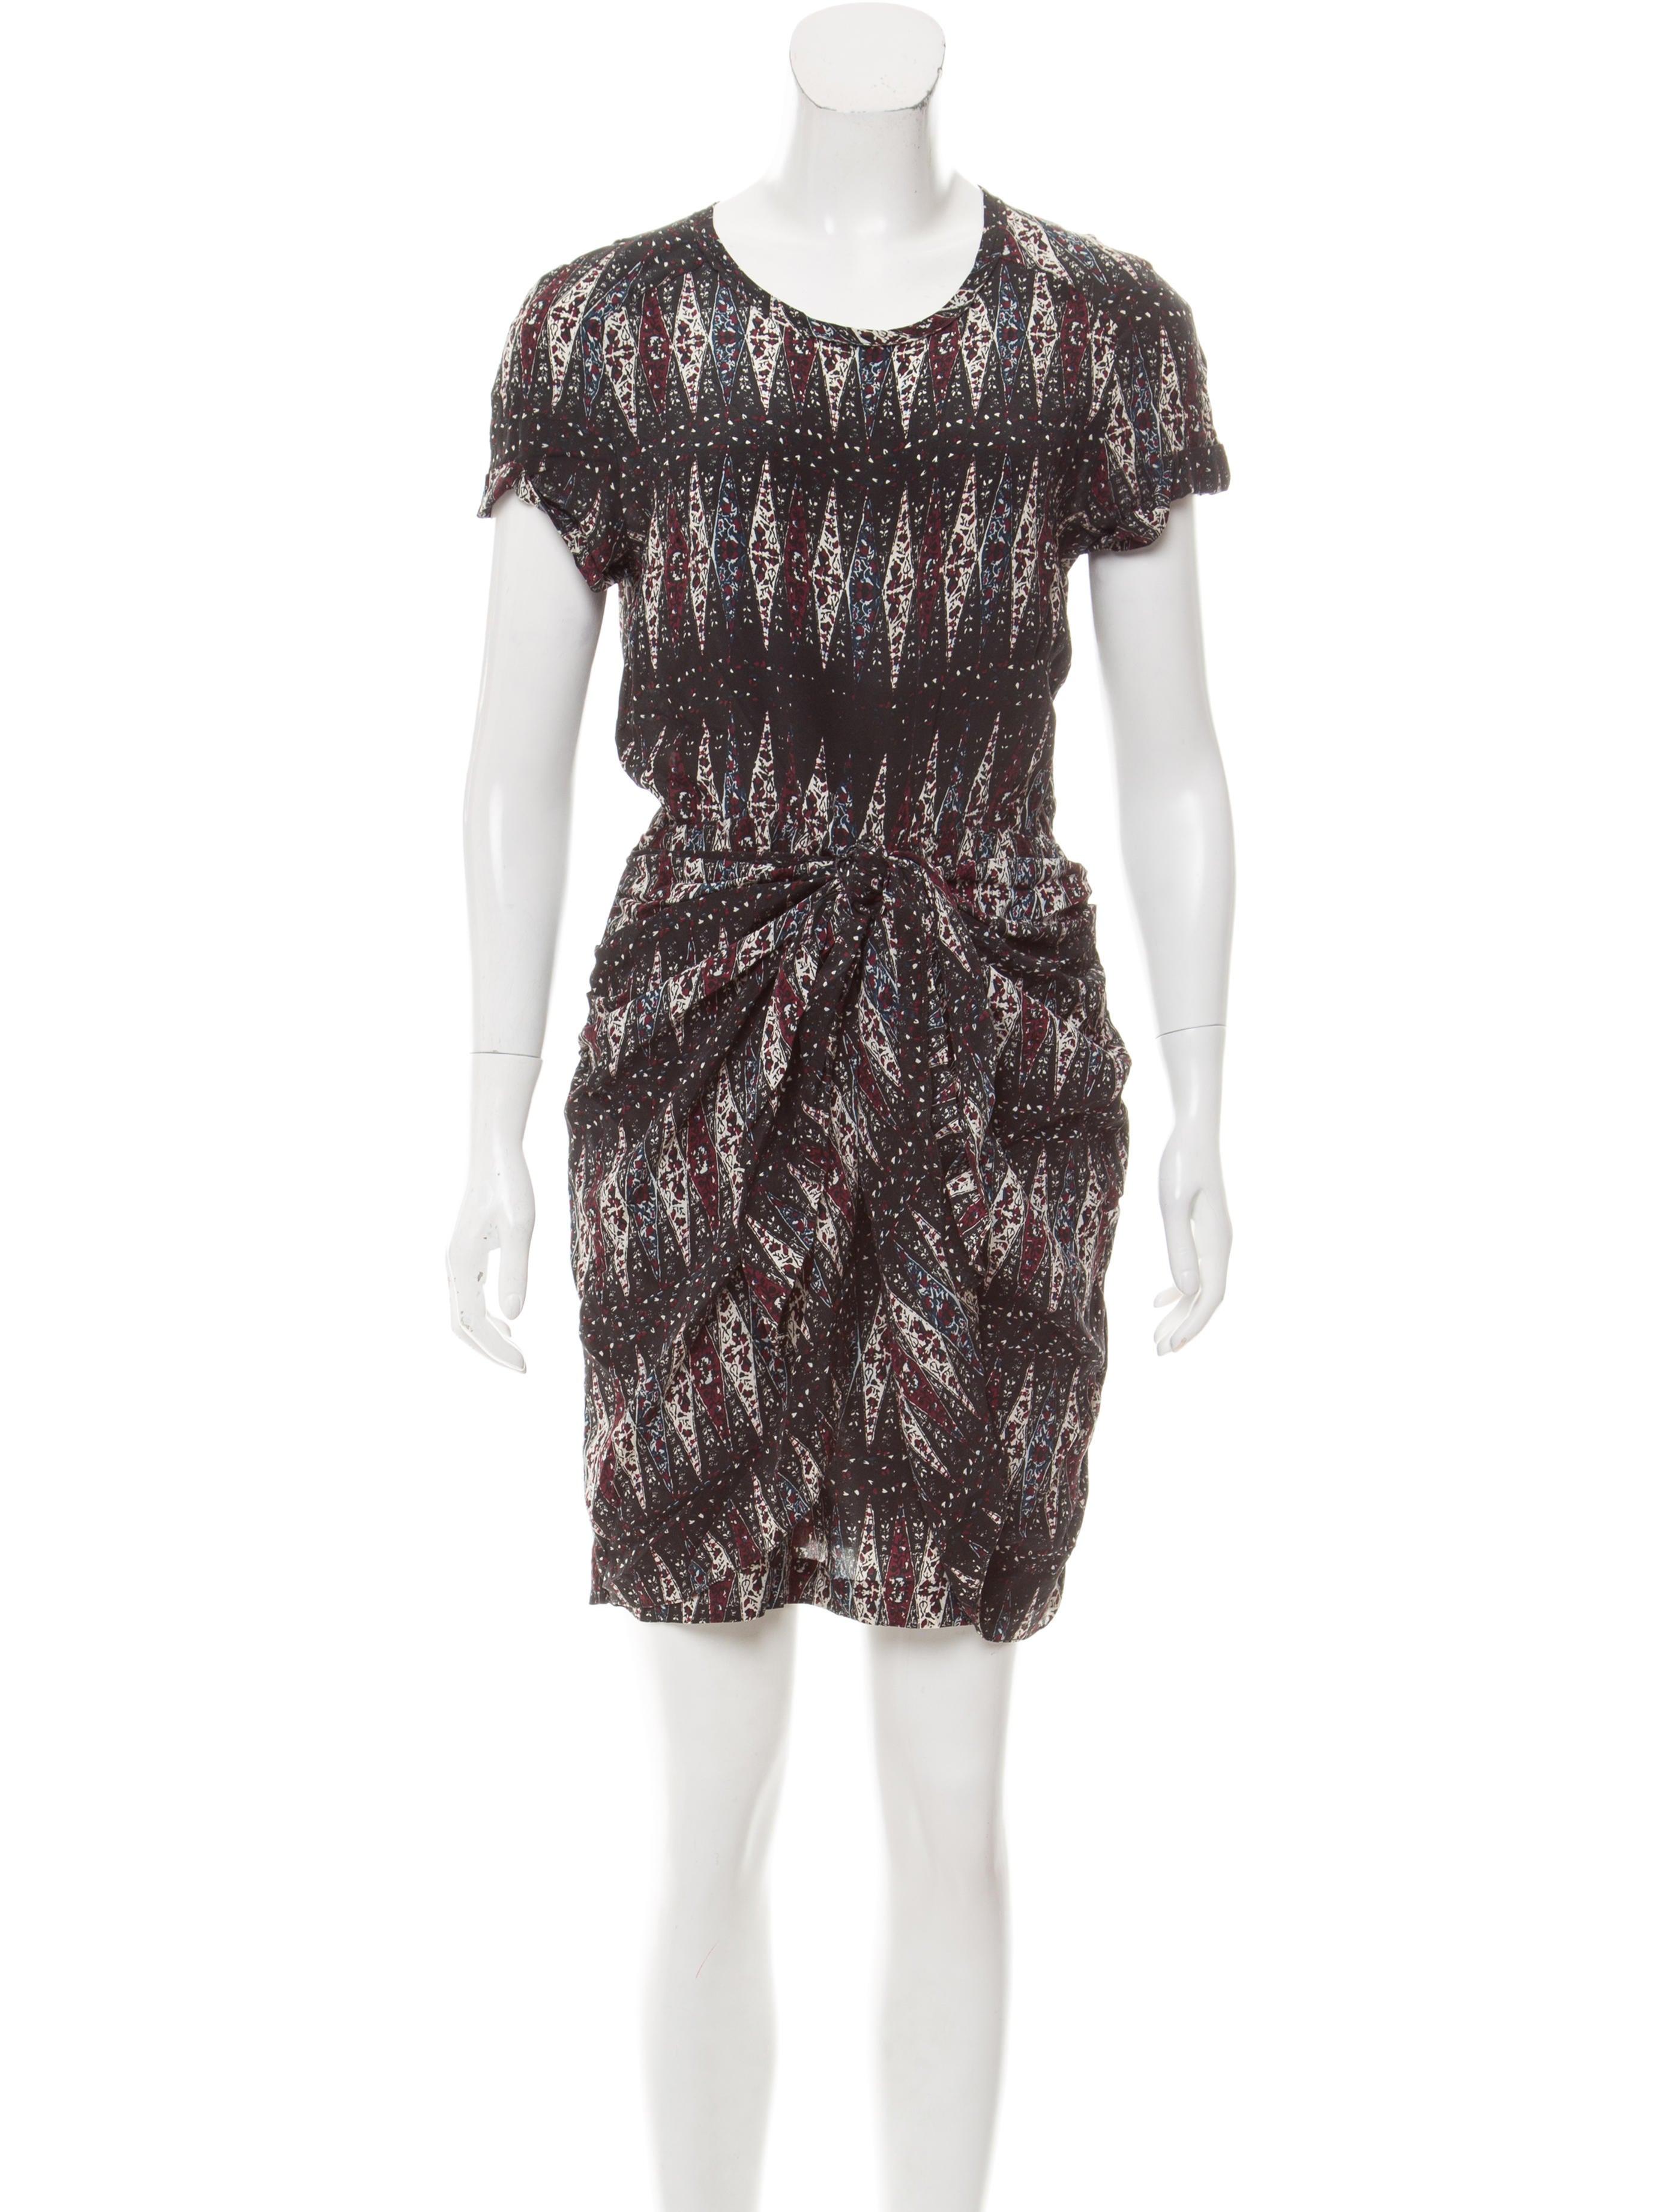 Toile isabel marant short sleeve printed dress clothing for Isabel marant shirt dress